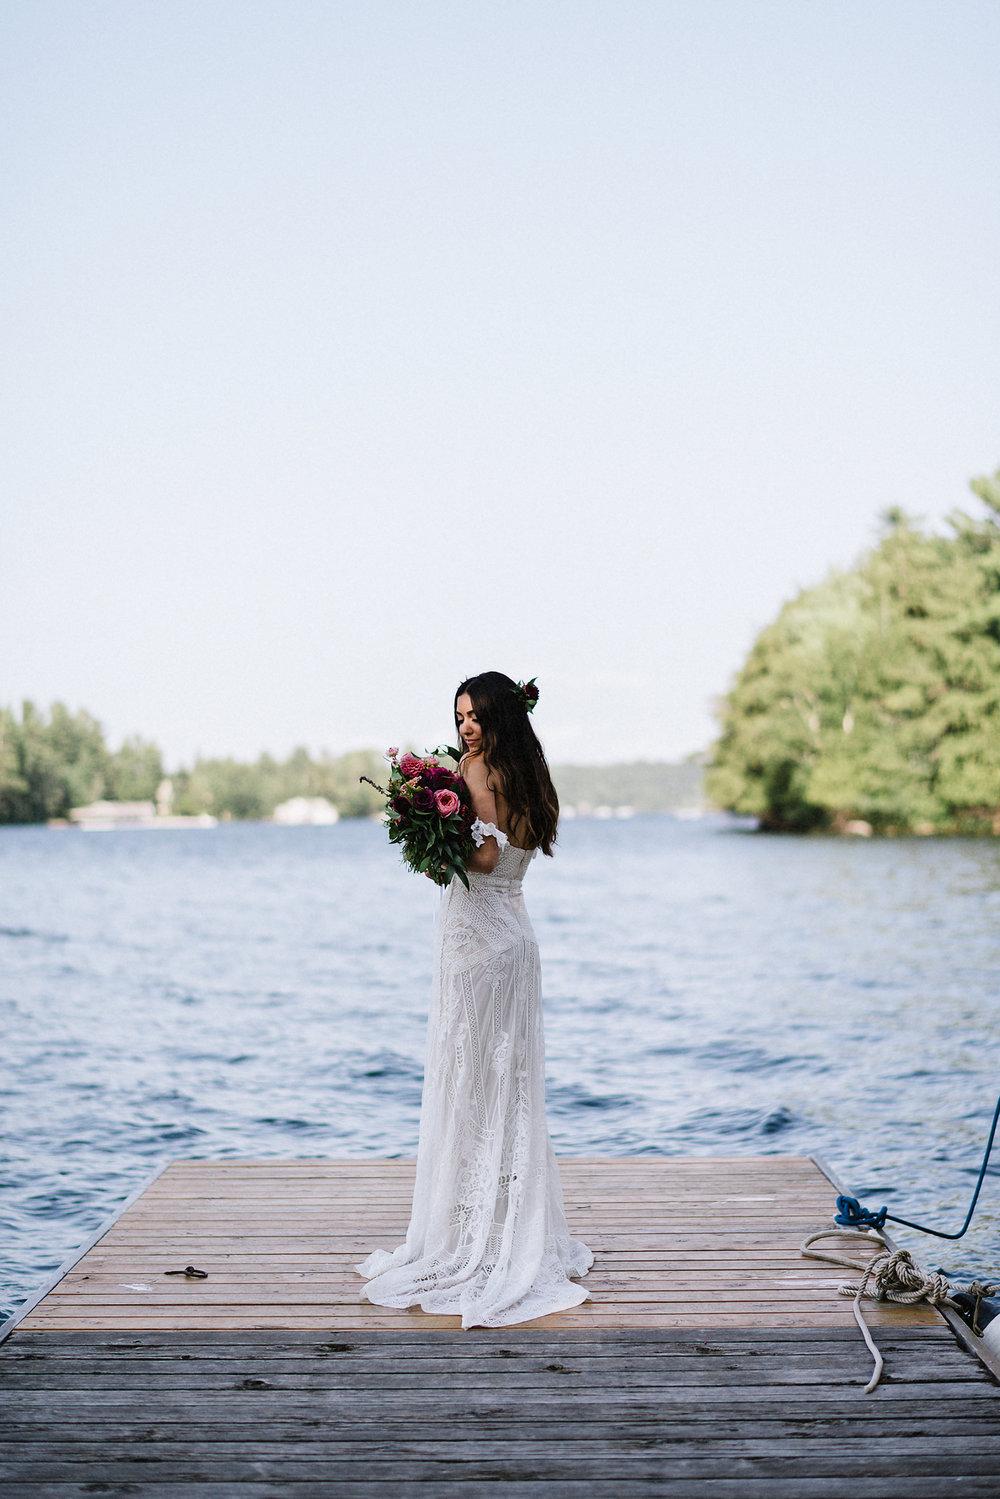 Muskoka-Cottage-Wedding-Photography-Photographer_Photojournalistic-Documentary-Wedding-Photography_Vintage-Bride-Lovers-Land-Dress_Rue-Des-Seins_Bridal-Portrait-Boho-bride-Toronto-Bride-by-lakeside.jpg